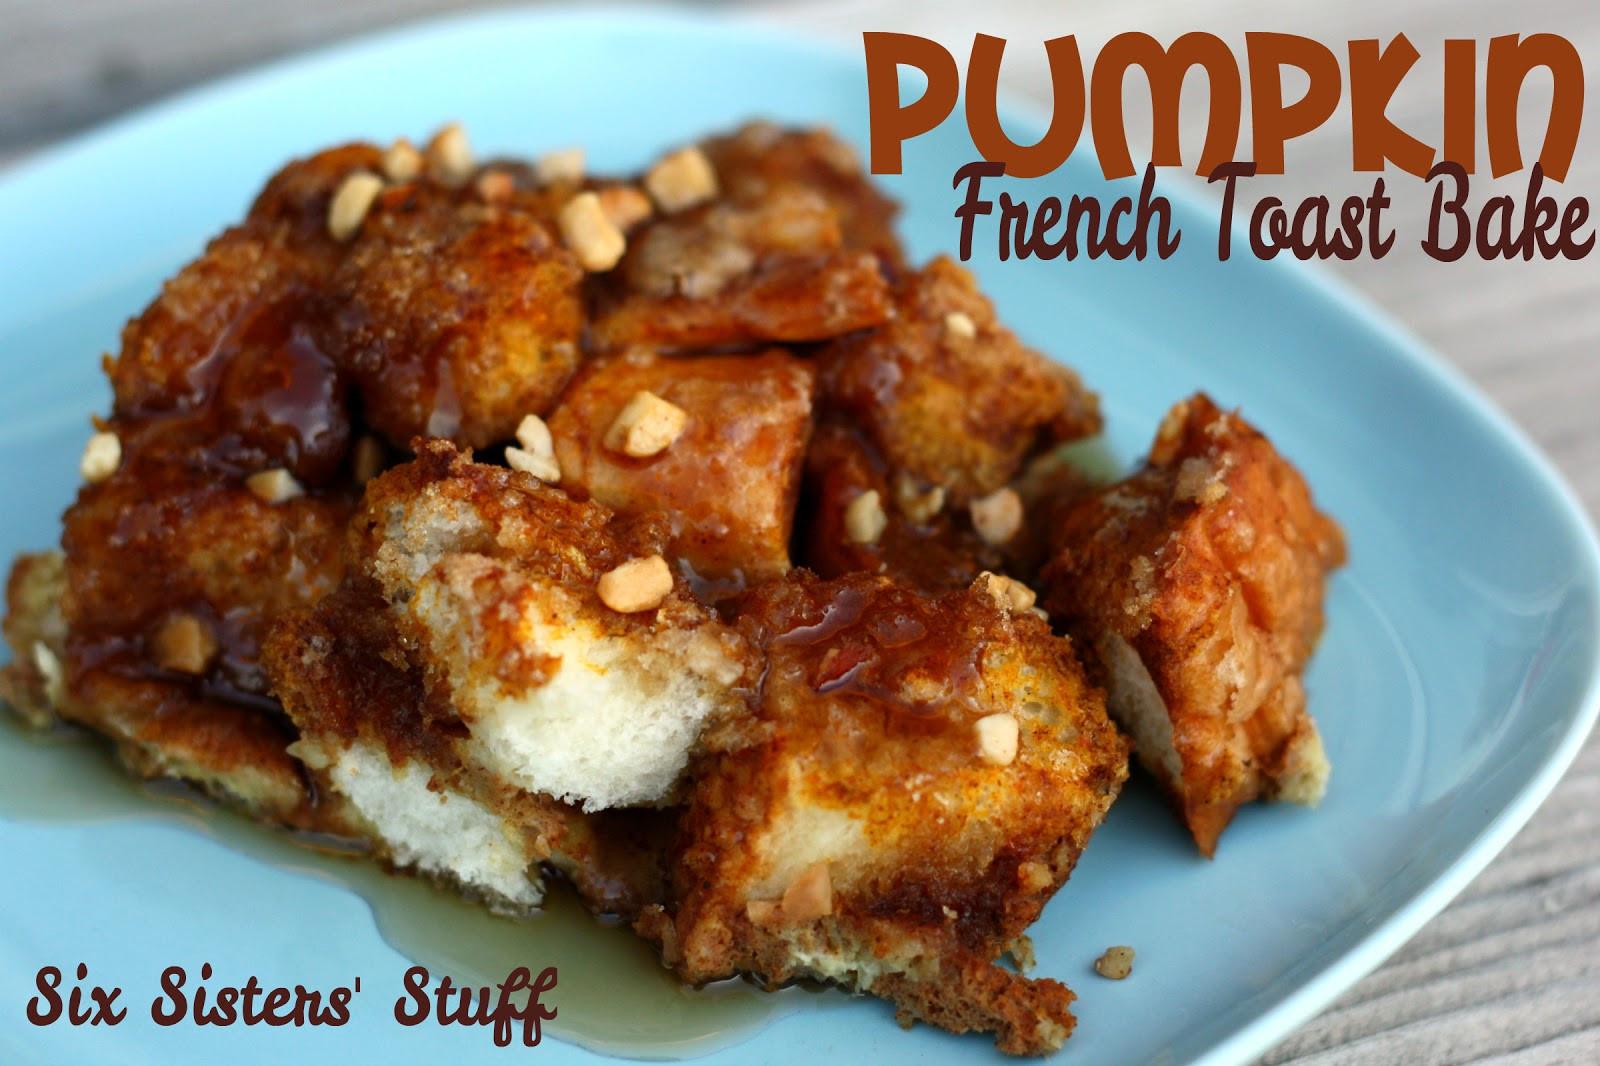 Pumpkin French Toast Casserole  Pumpkin French Toast Bake